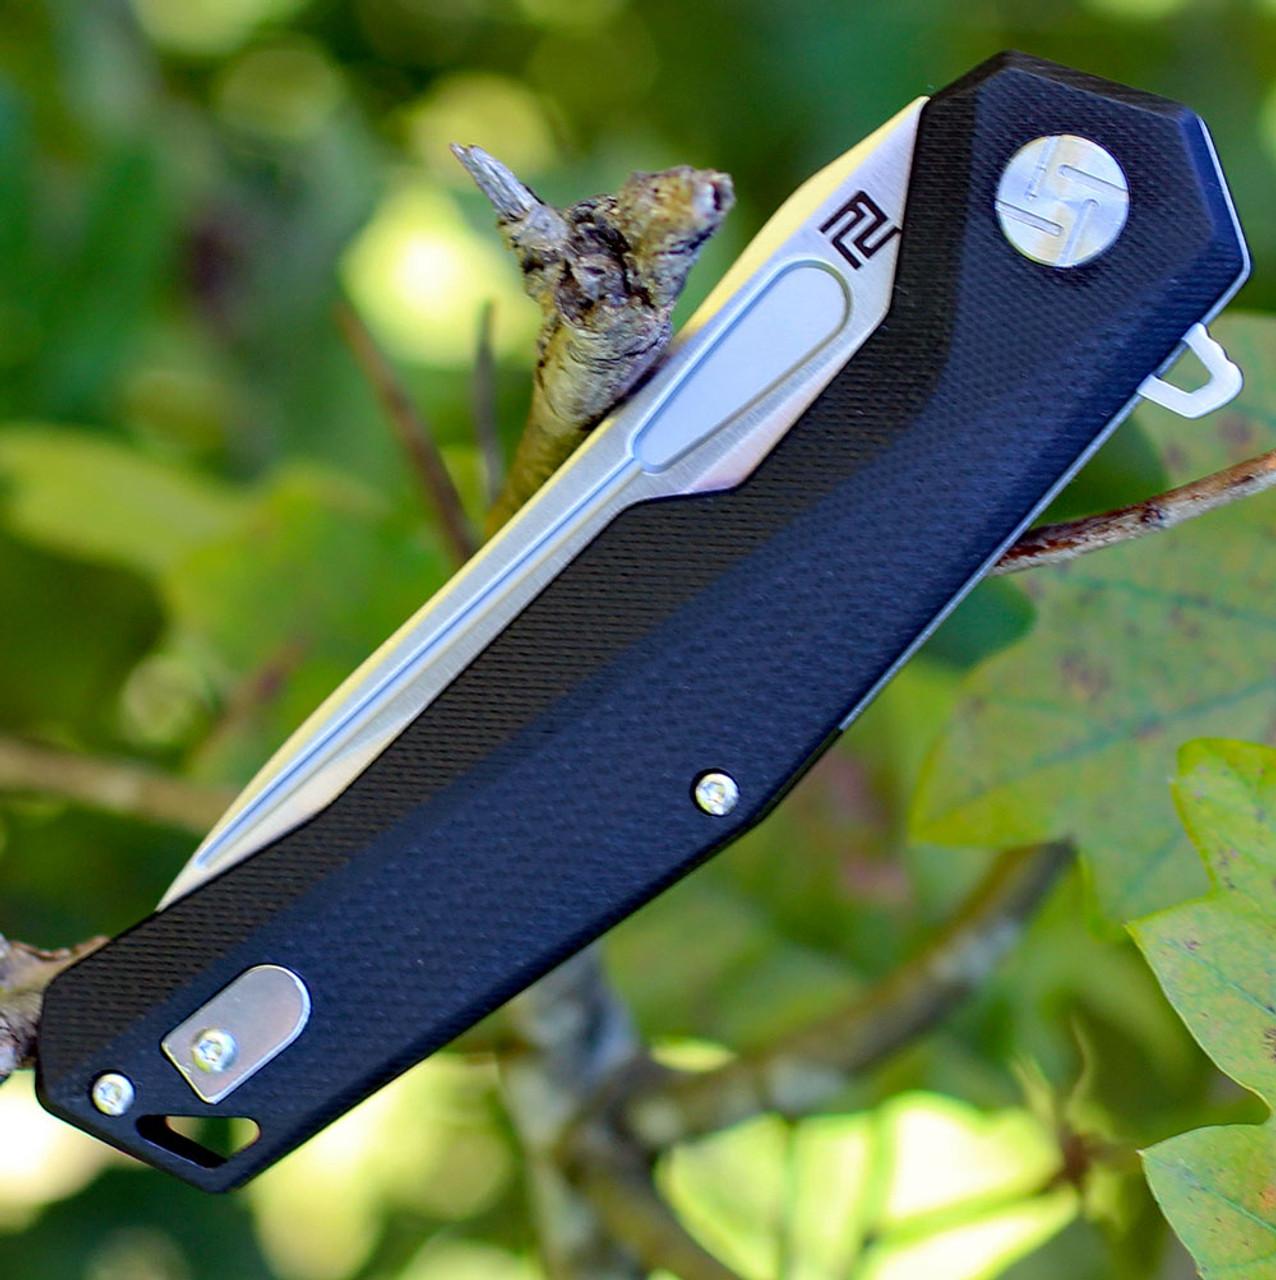 "Artisan Zumwalt ATZ1808PBKC, 3.94"" D2 Plain Blade, Curved Black G-10 Handle"